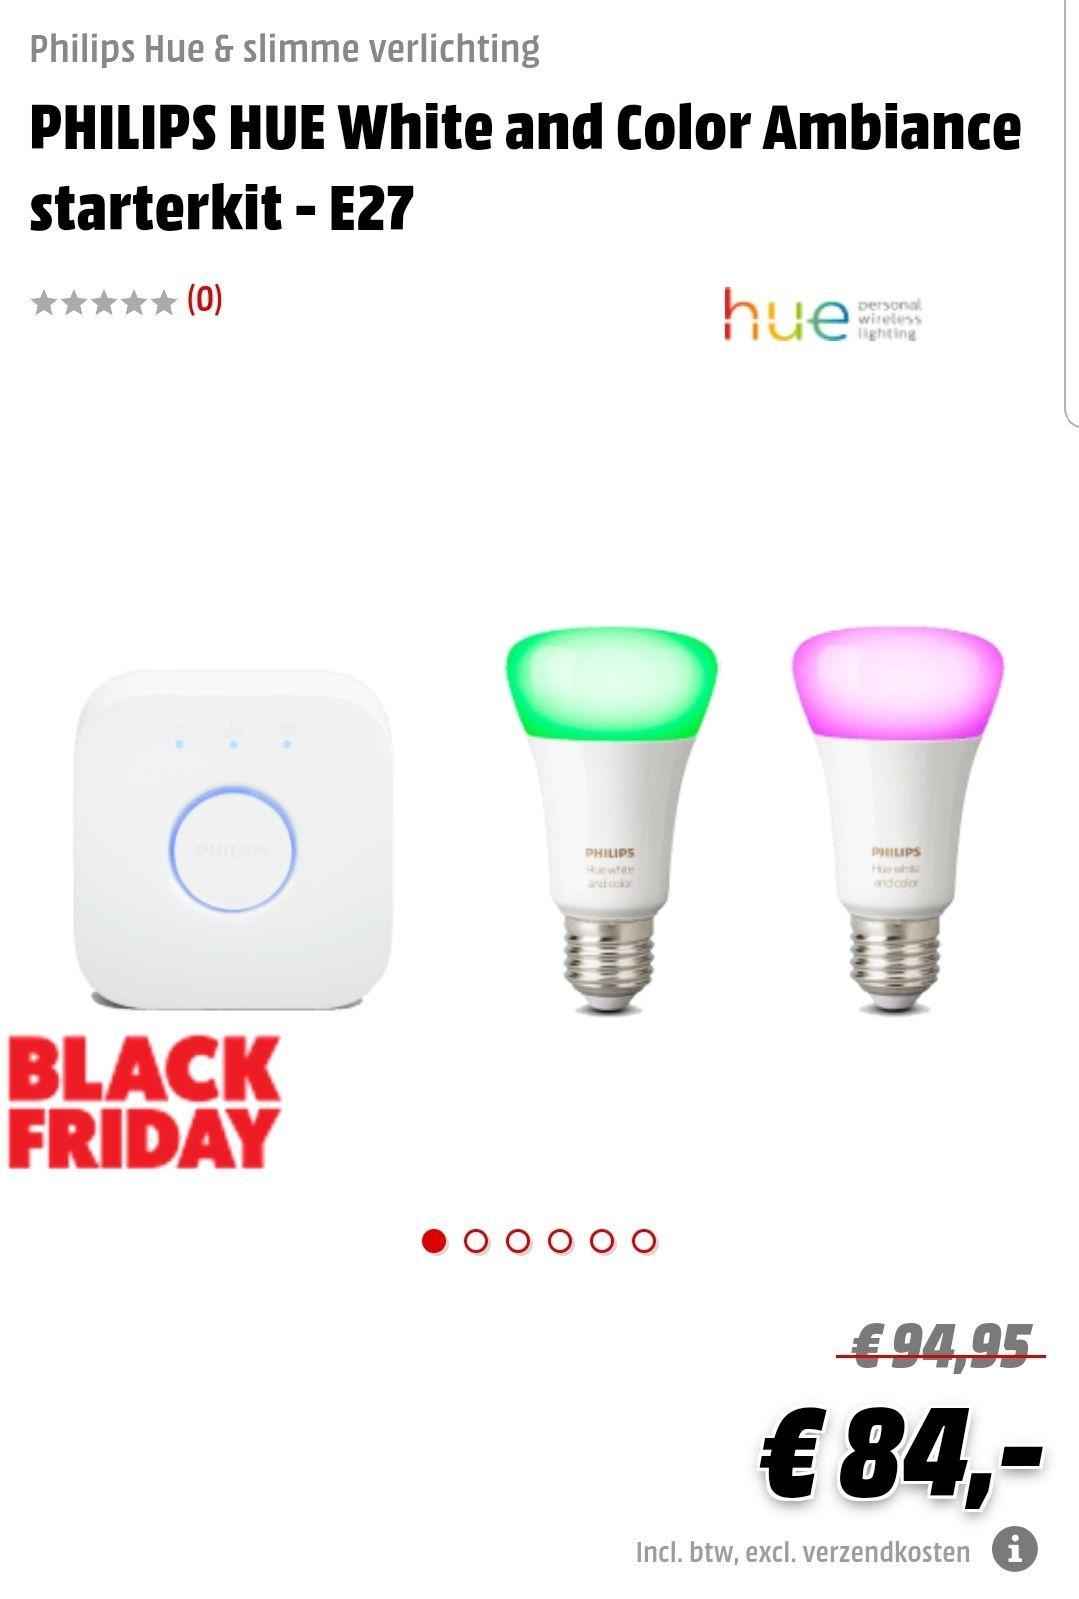 Philips Hue starter kit met 2 color lampen